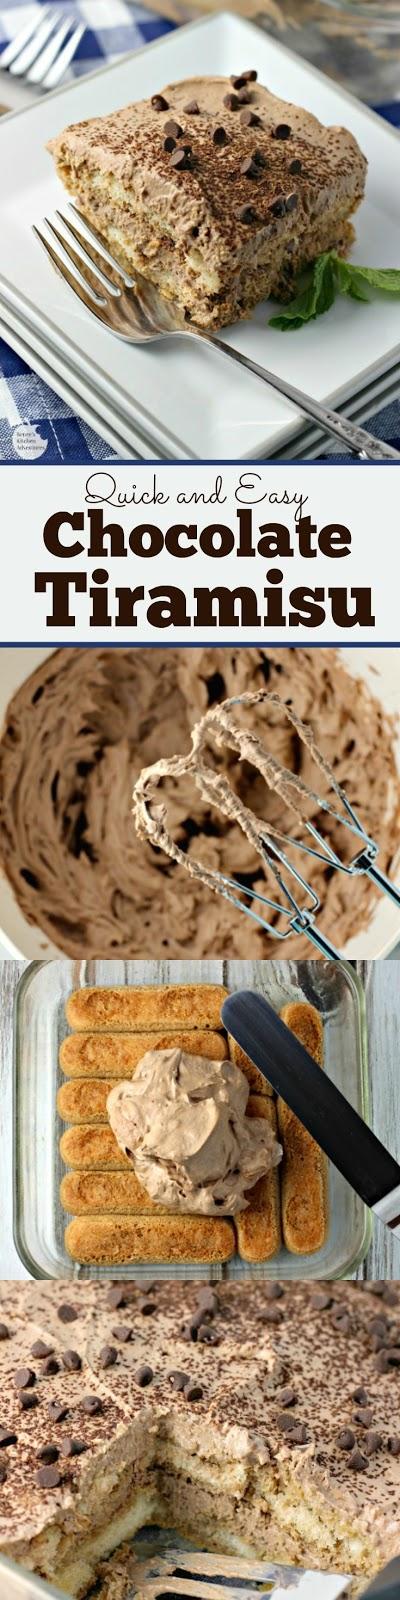 Chocolate tiramisu renee 39 s kitchen adventures for Renee s kitchen